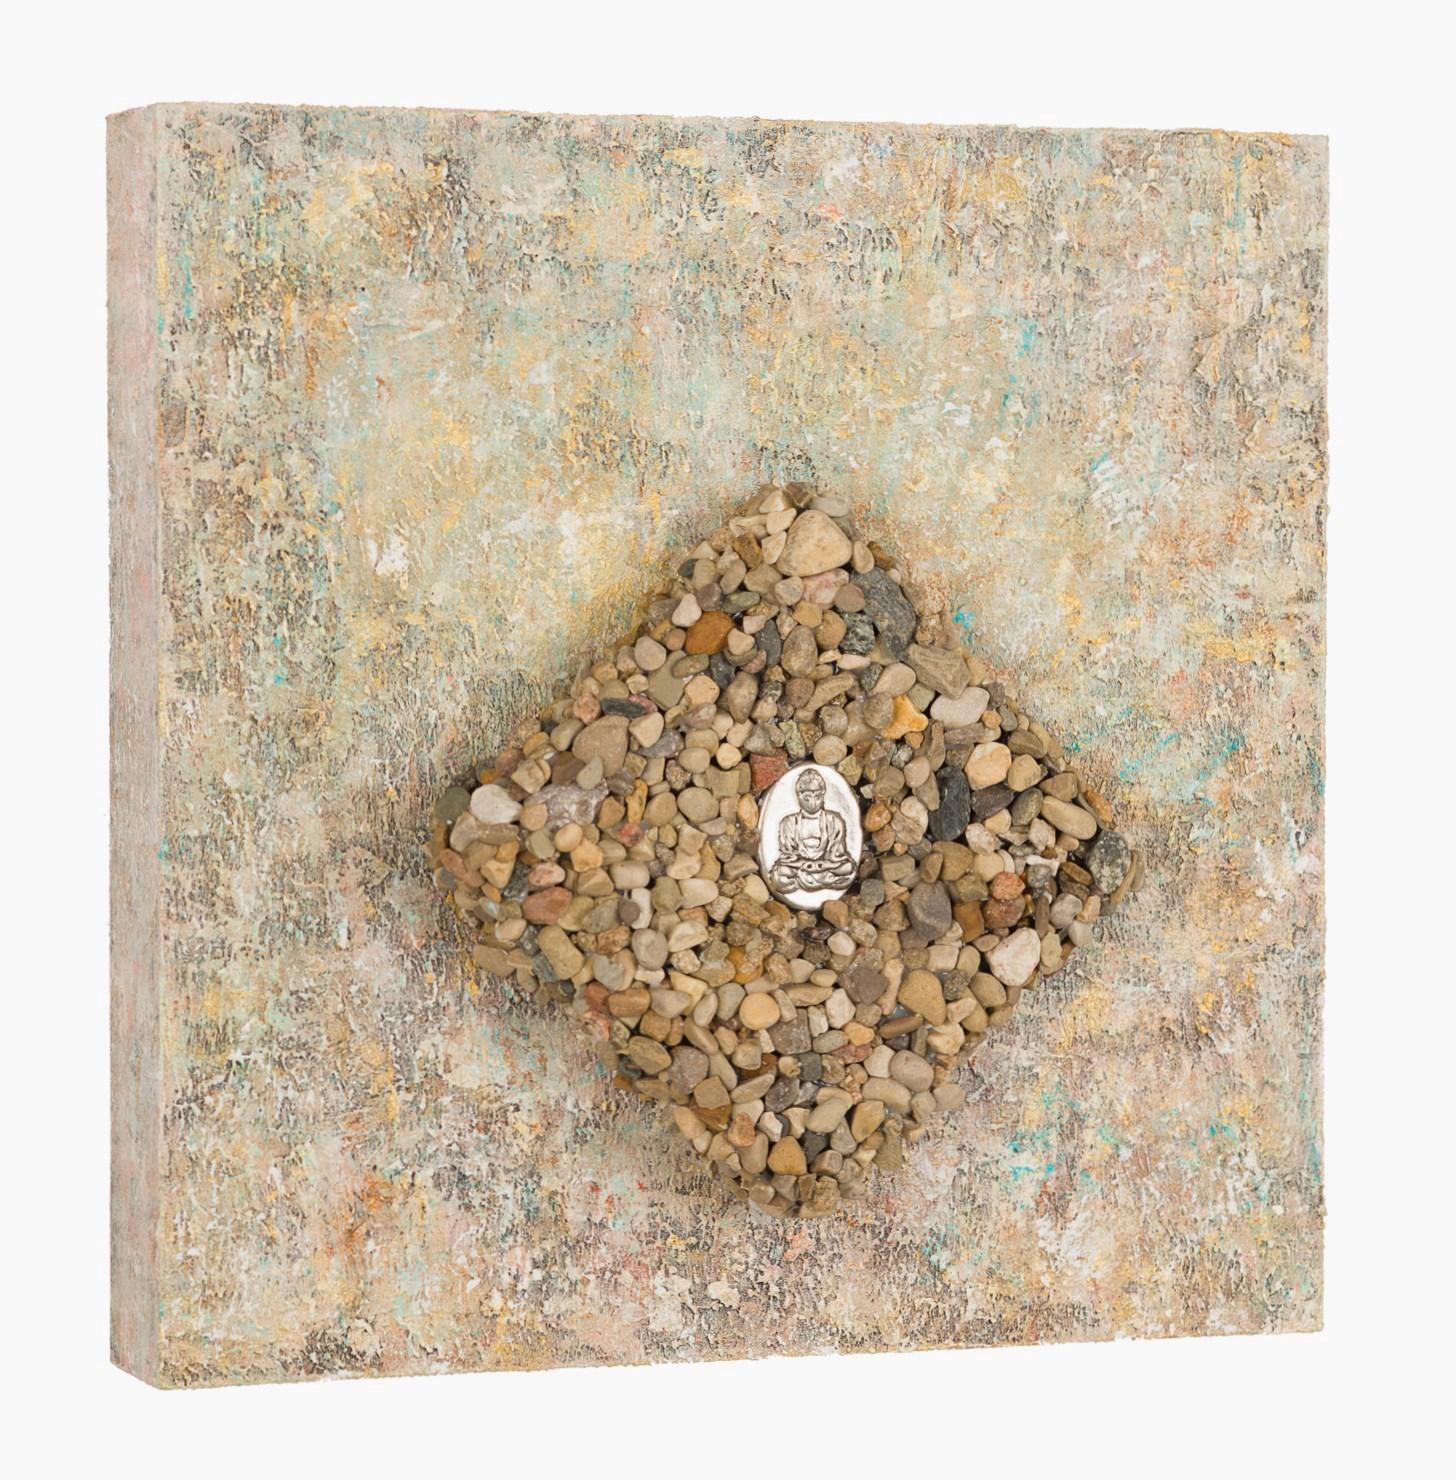 "Centered, Grounded, Breathe, 2016   acrylic, mixed media on cradled wood panel, 10""x10"" © Marilyn Grad"